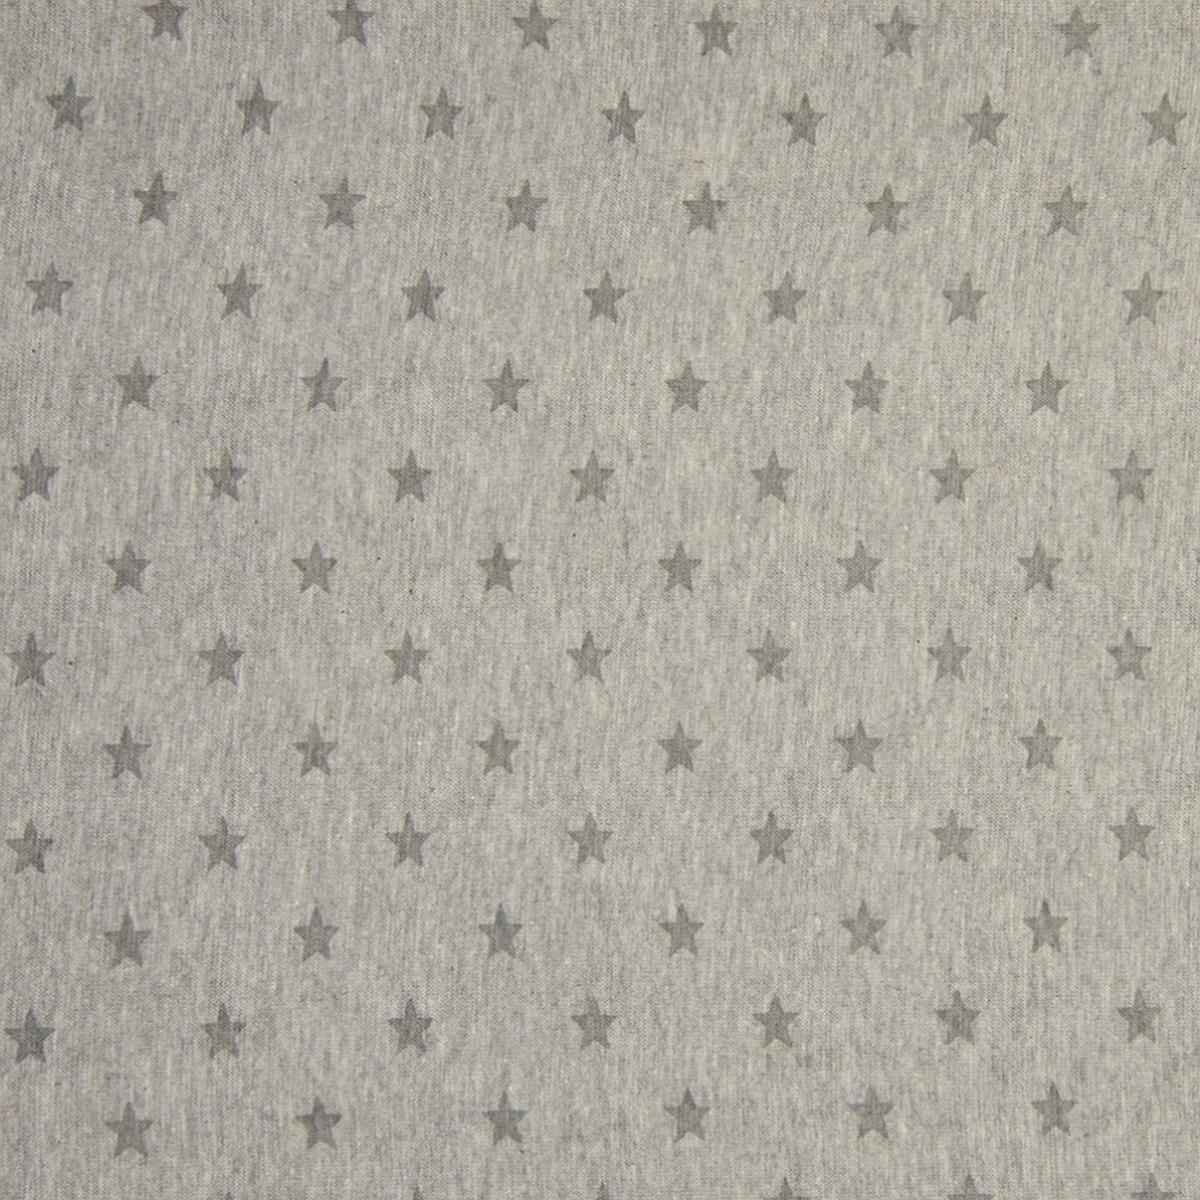 b ndchen mit sternen grau meliert. Black Bedroom Furniture Sets. Home Design Ideas